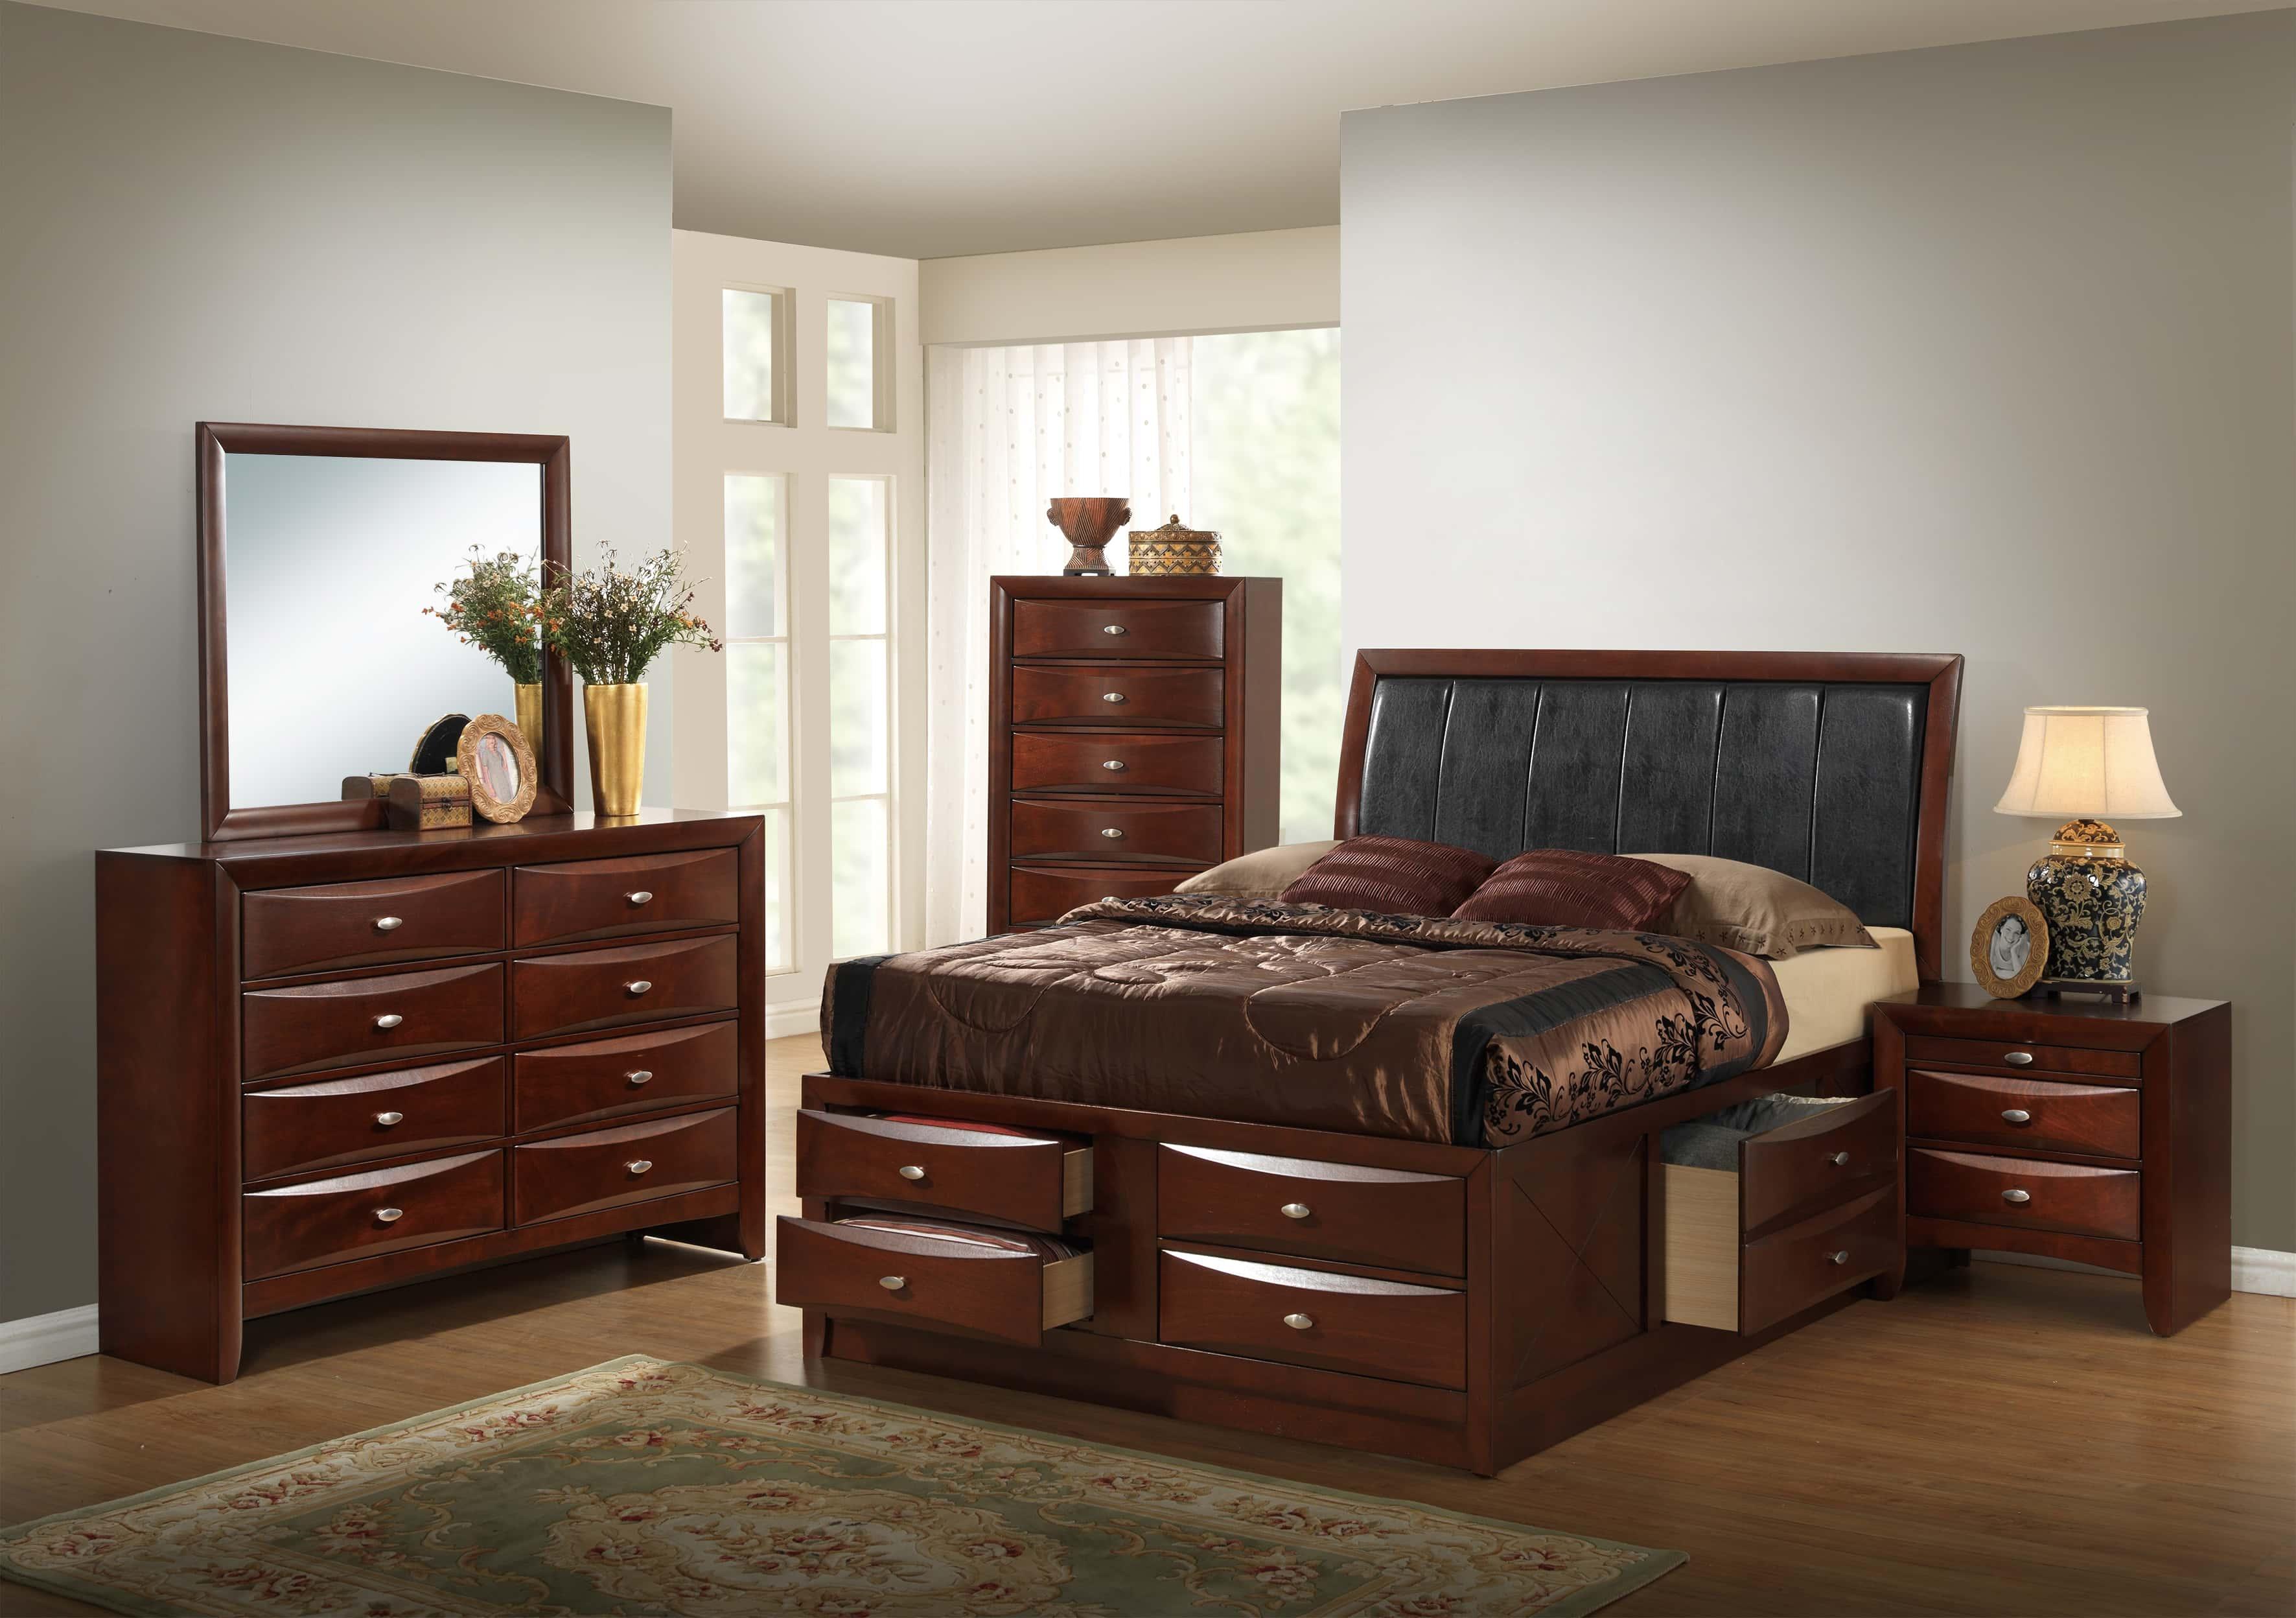 6ce7a594f431c Merlot Bedroom Furniture - Bedroom design ideas